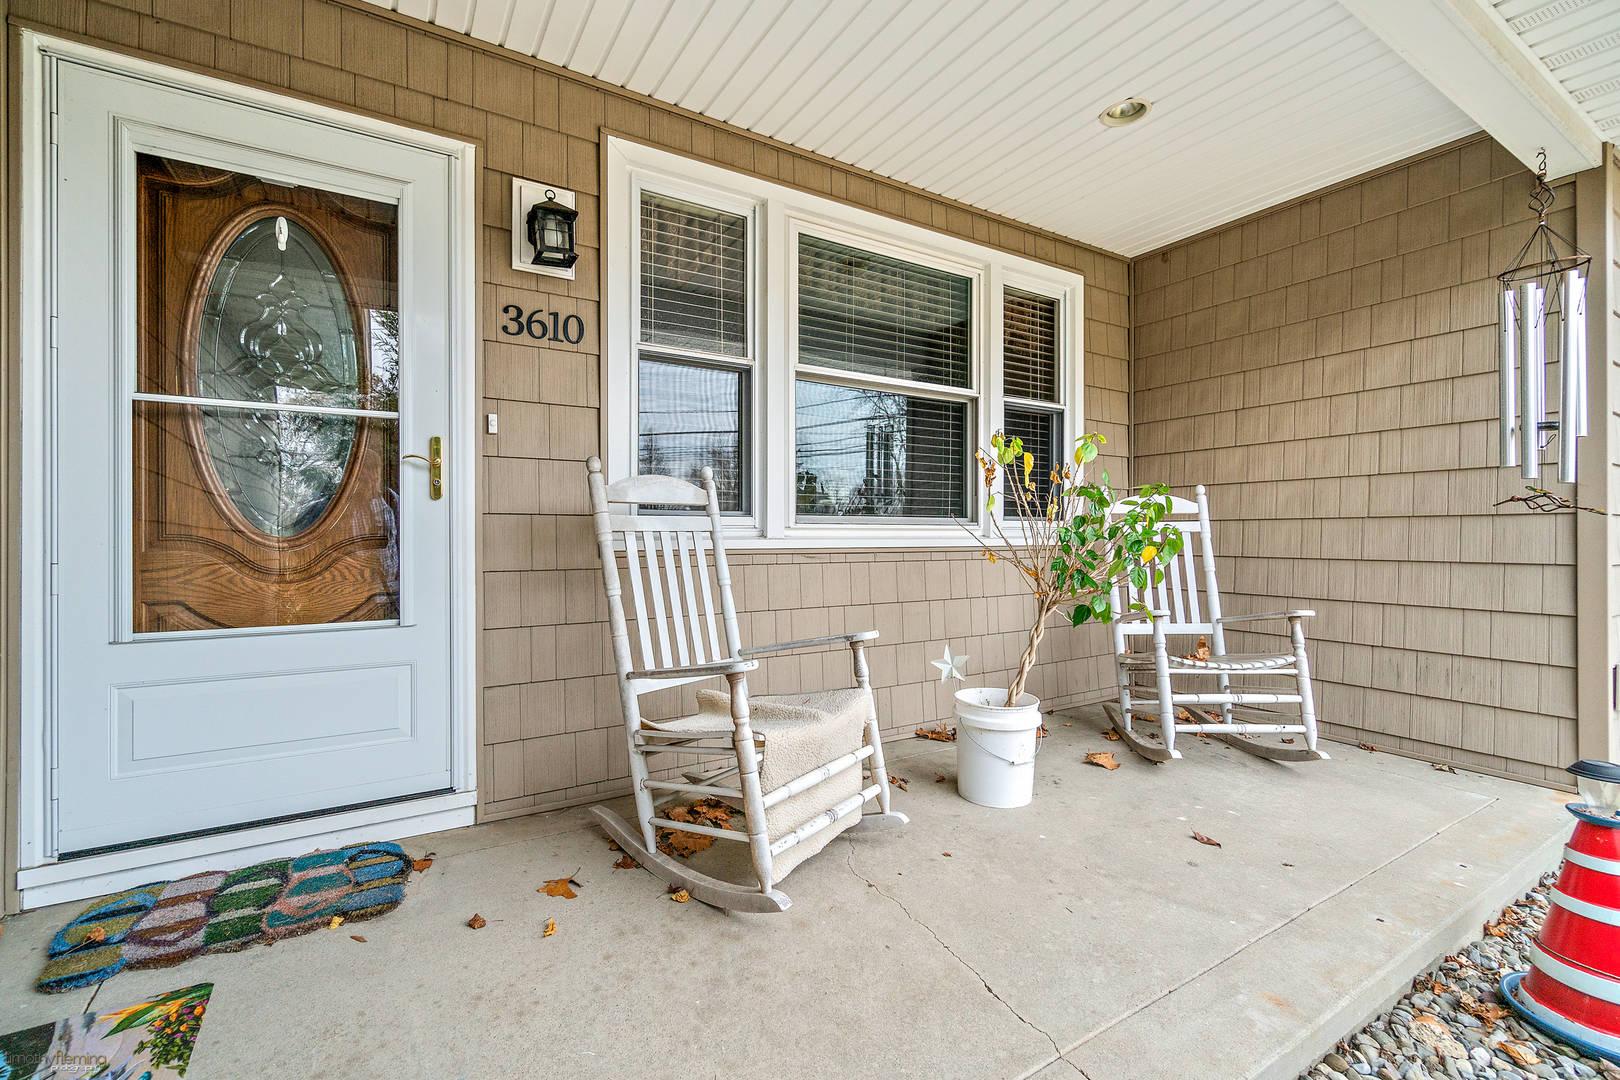 3610 Bayshore Rd North Cape May, NJ 08204